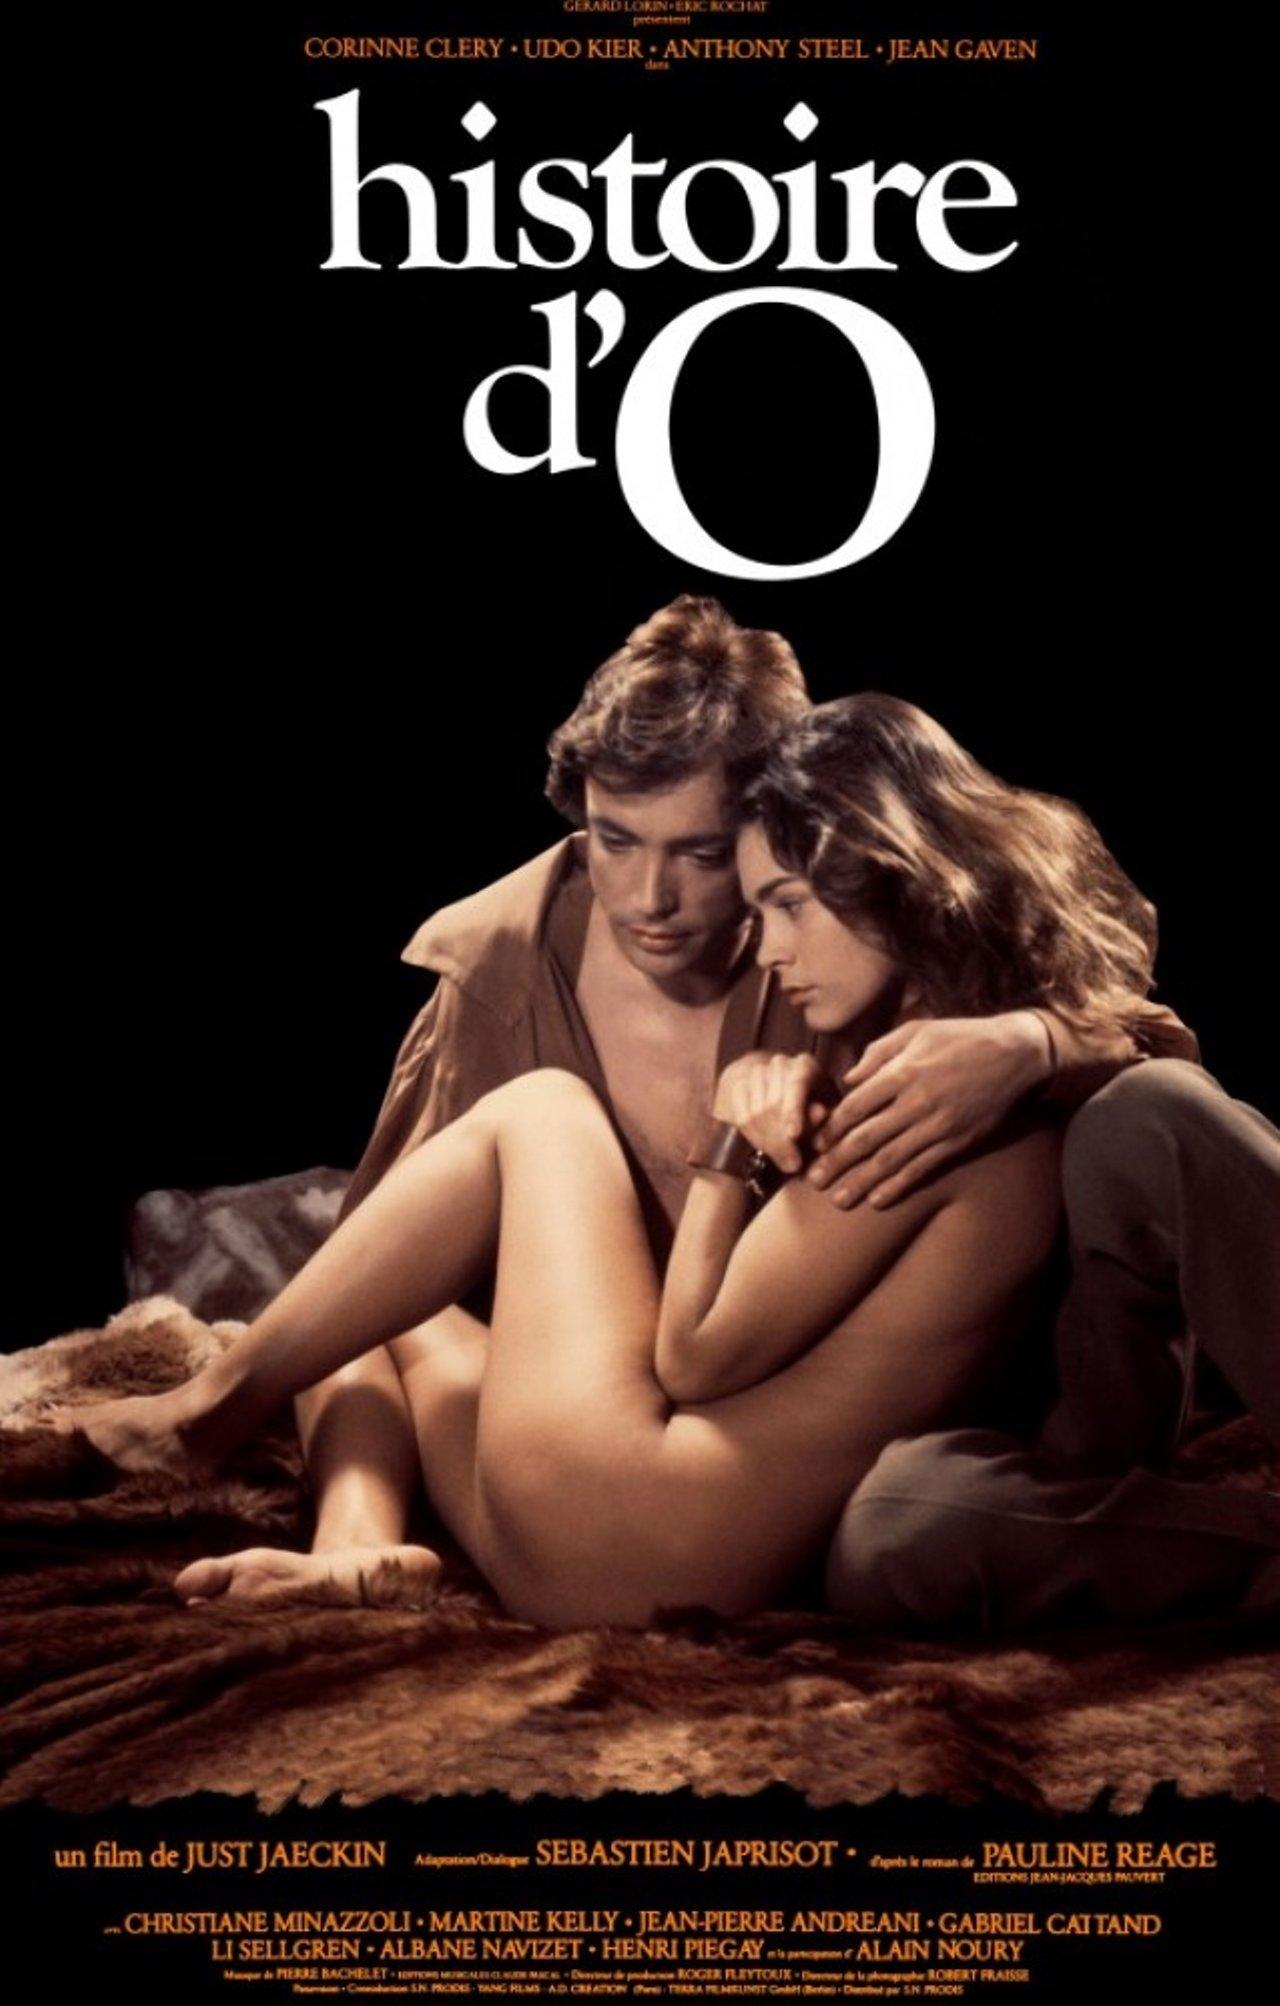 onlayn-drama-erotika-filmi